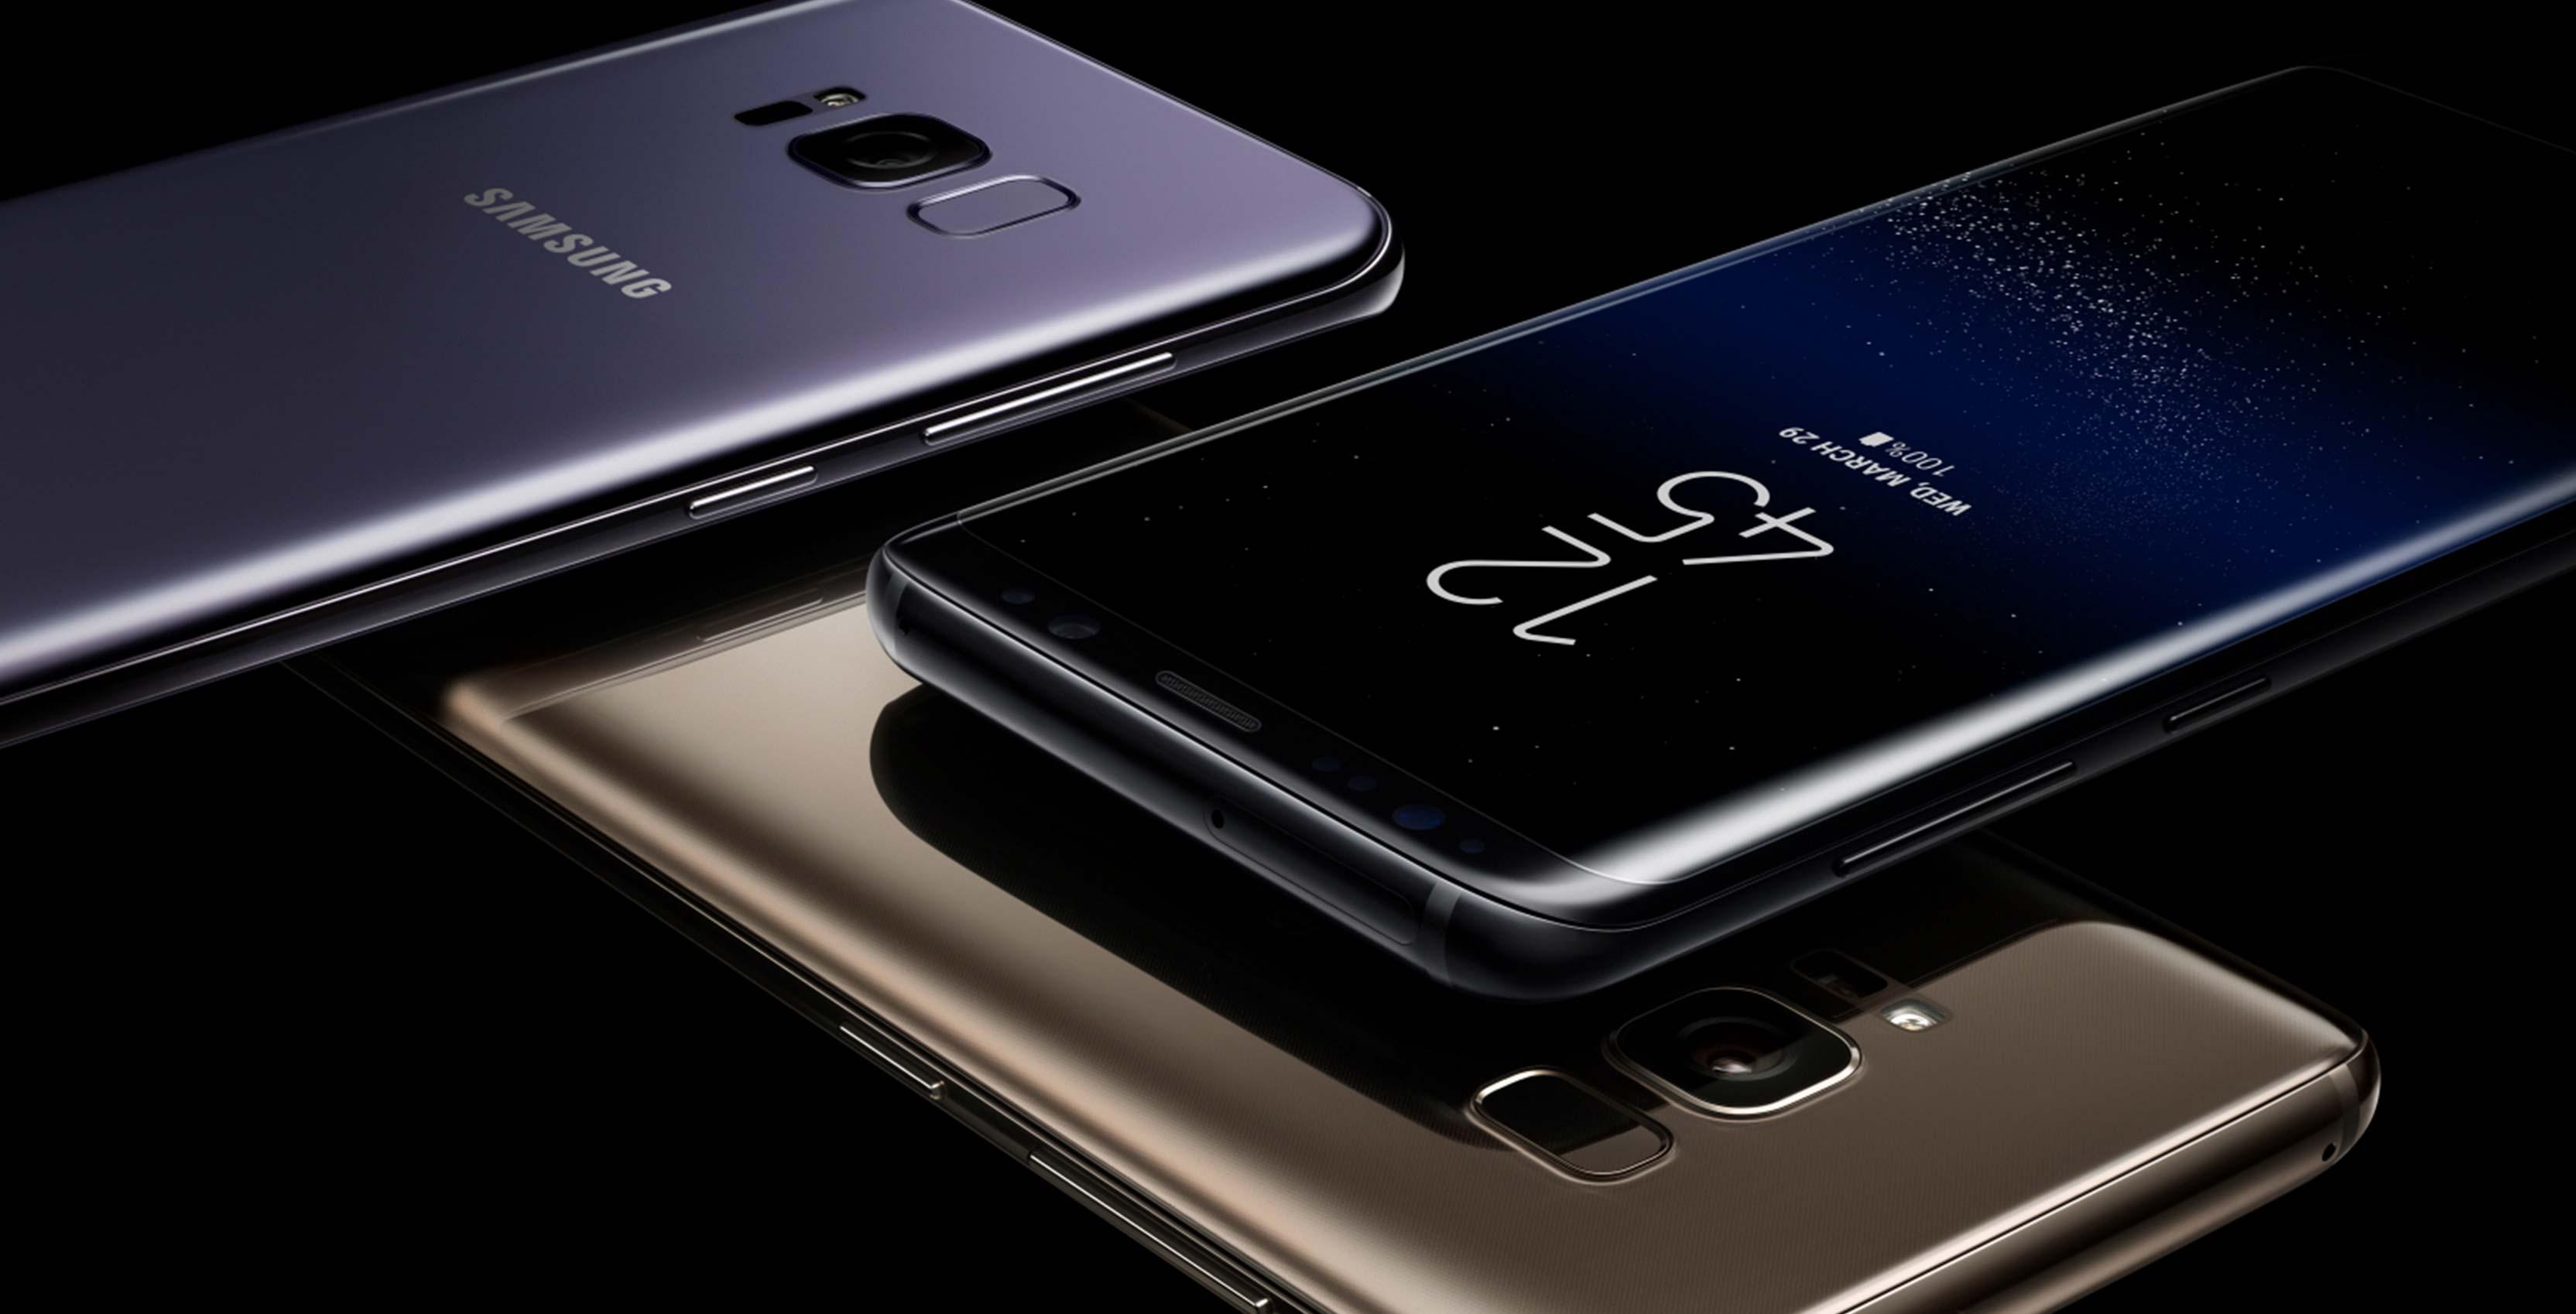 Samsung Galaxy S8 Design